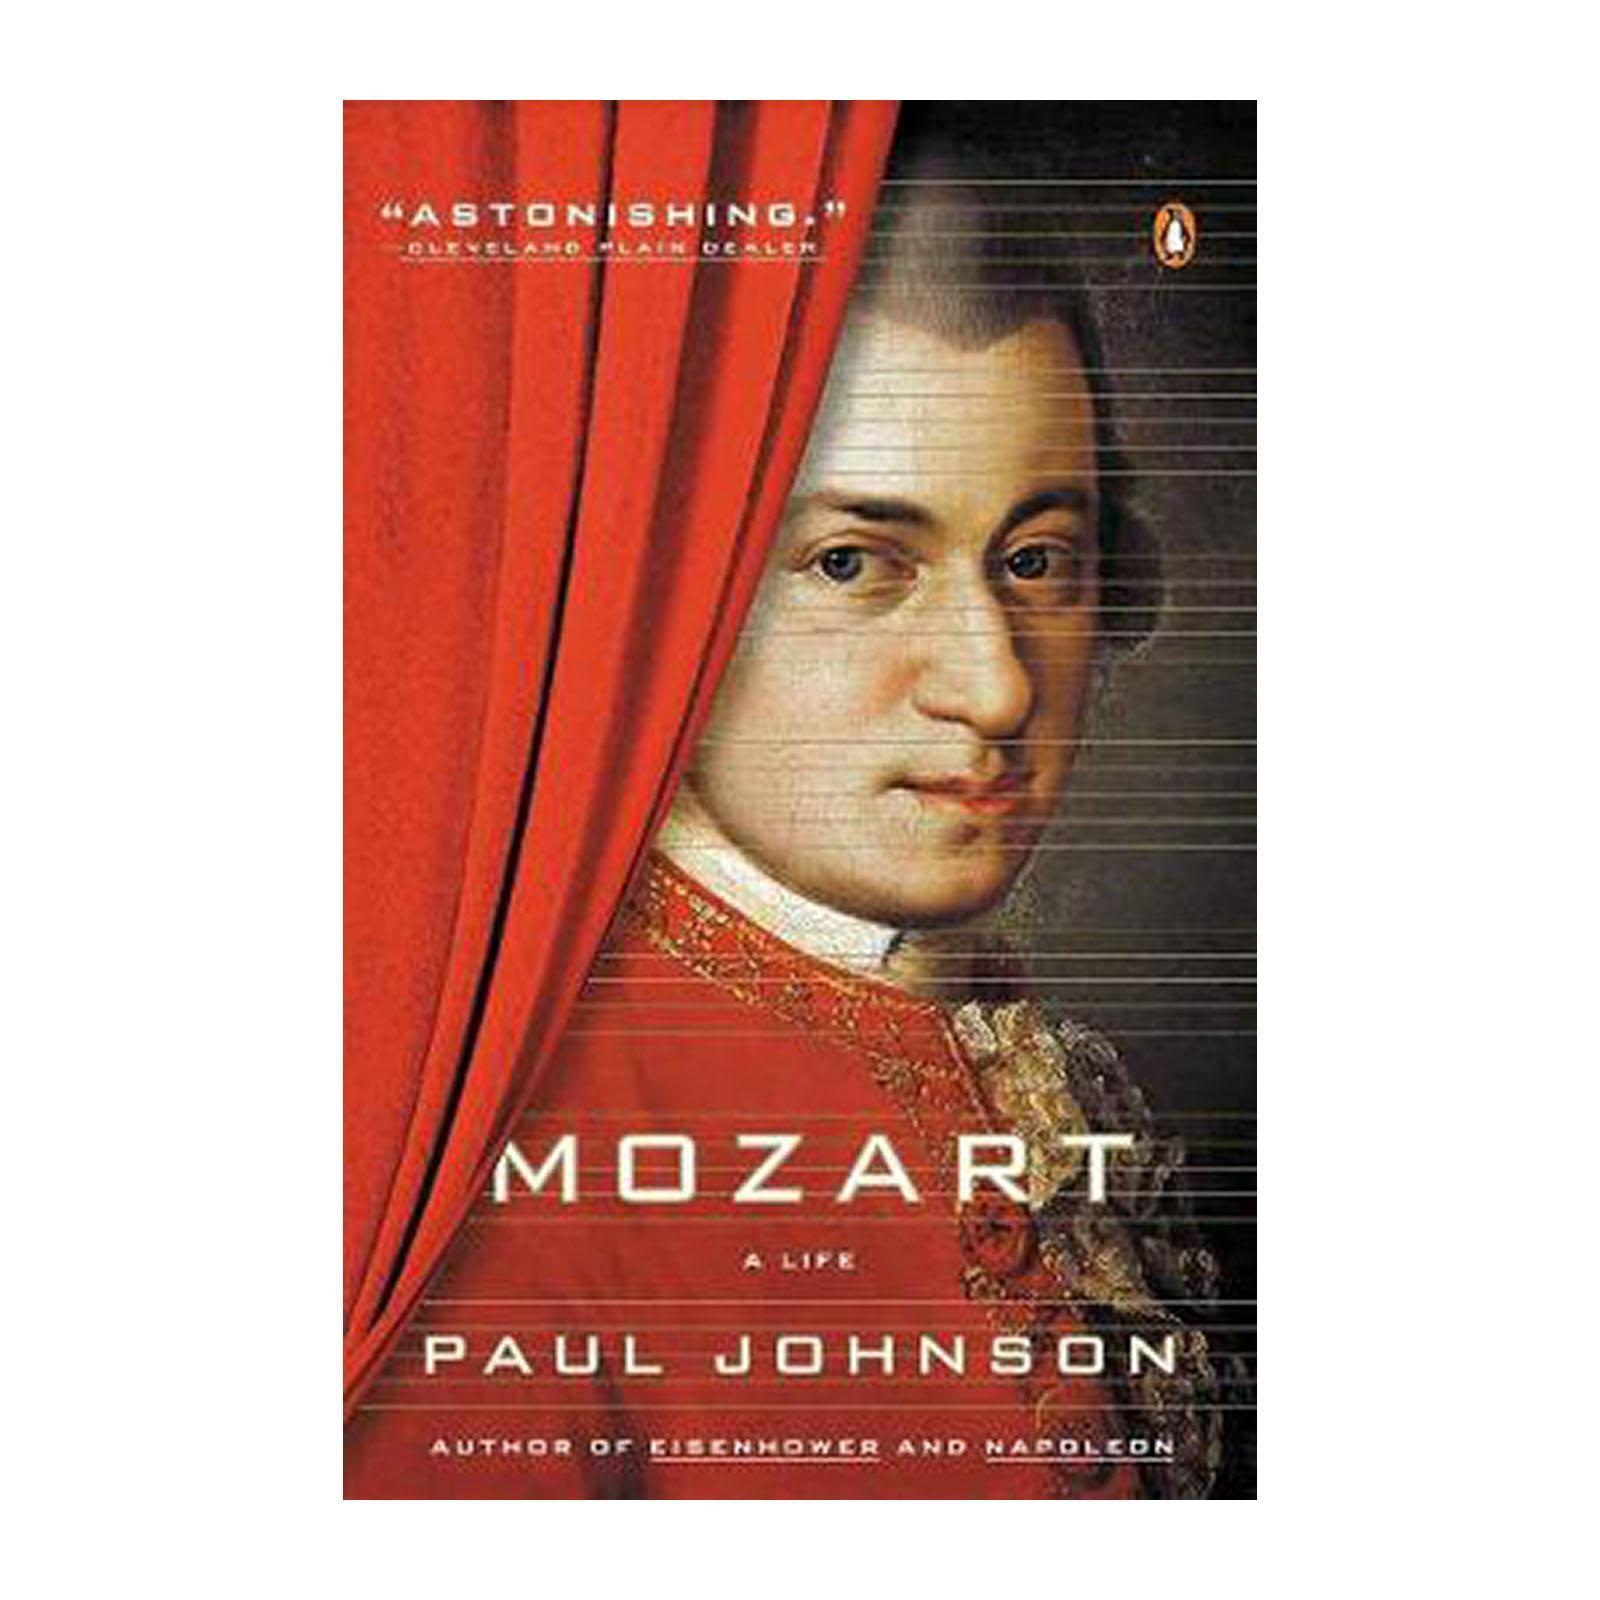 Mozart: A Life (Paperback)